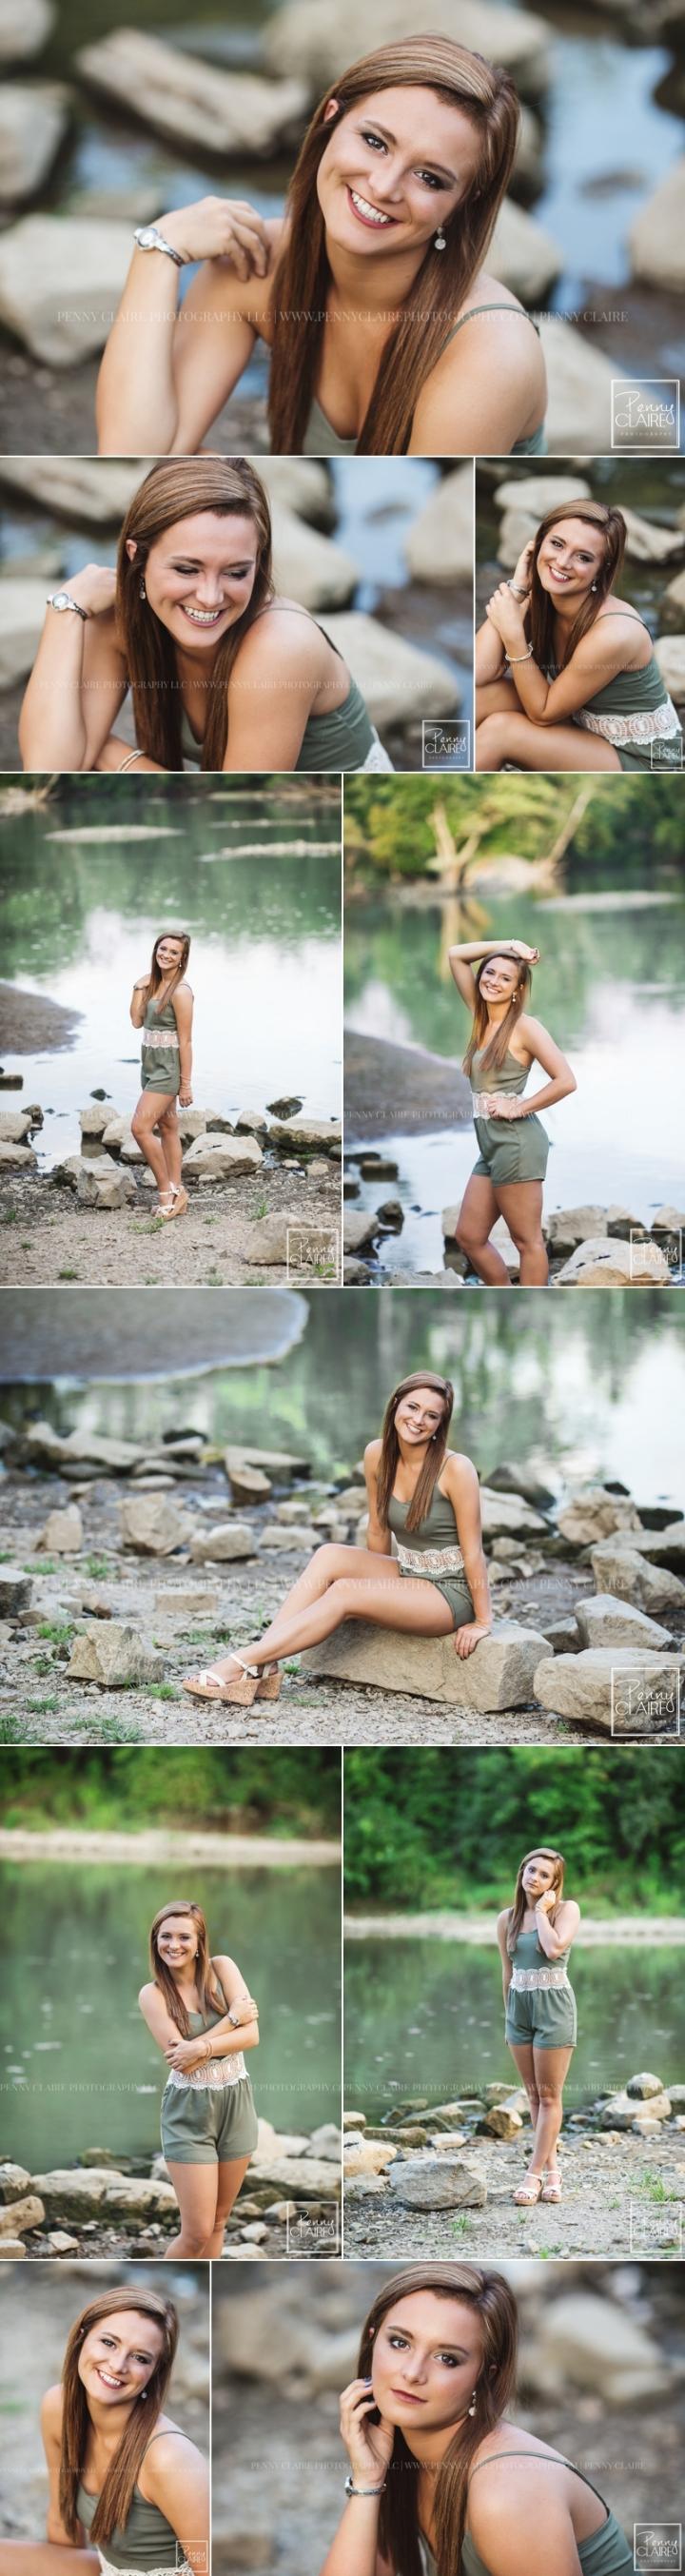 high-school-senior-photos-pennyclaire-3